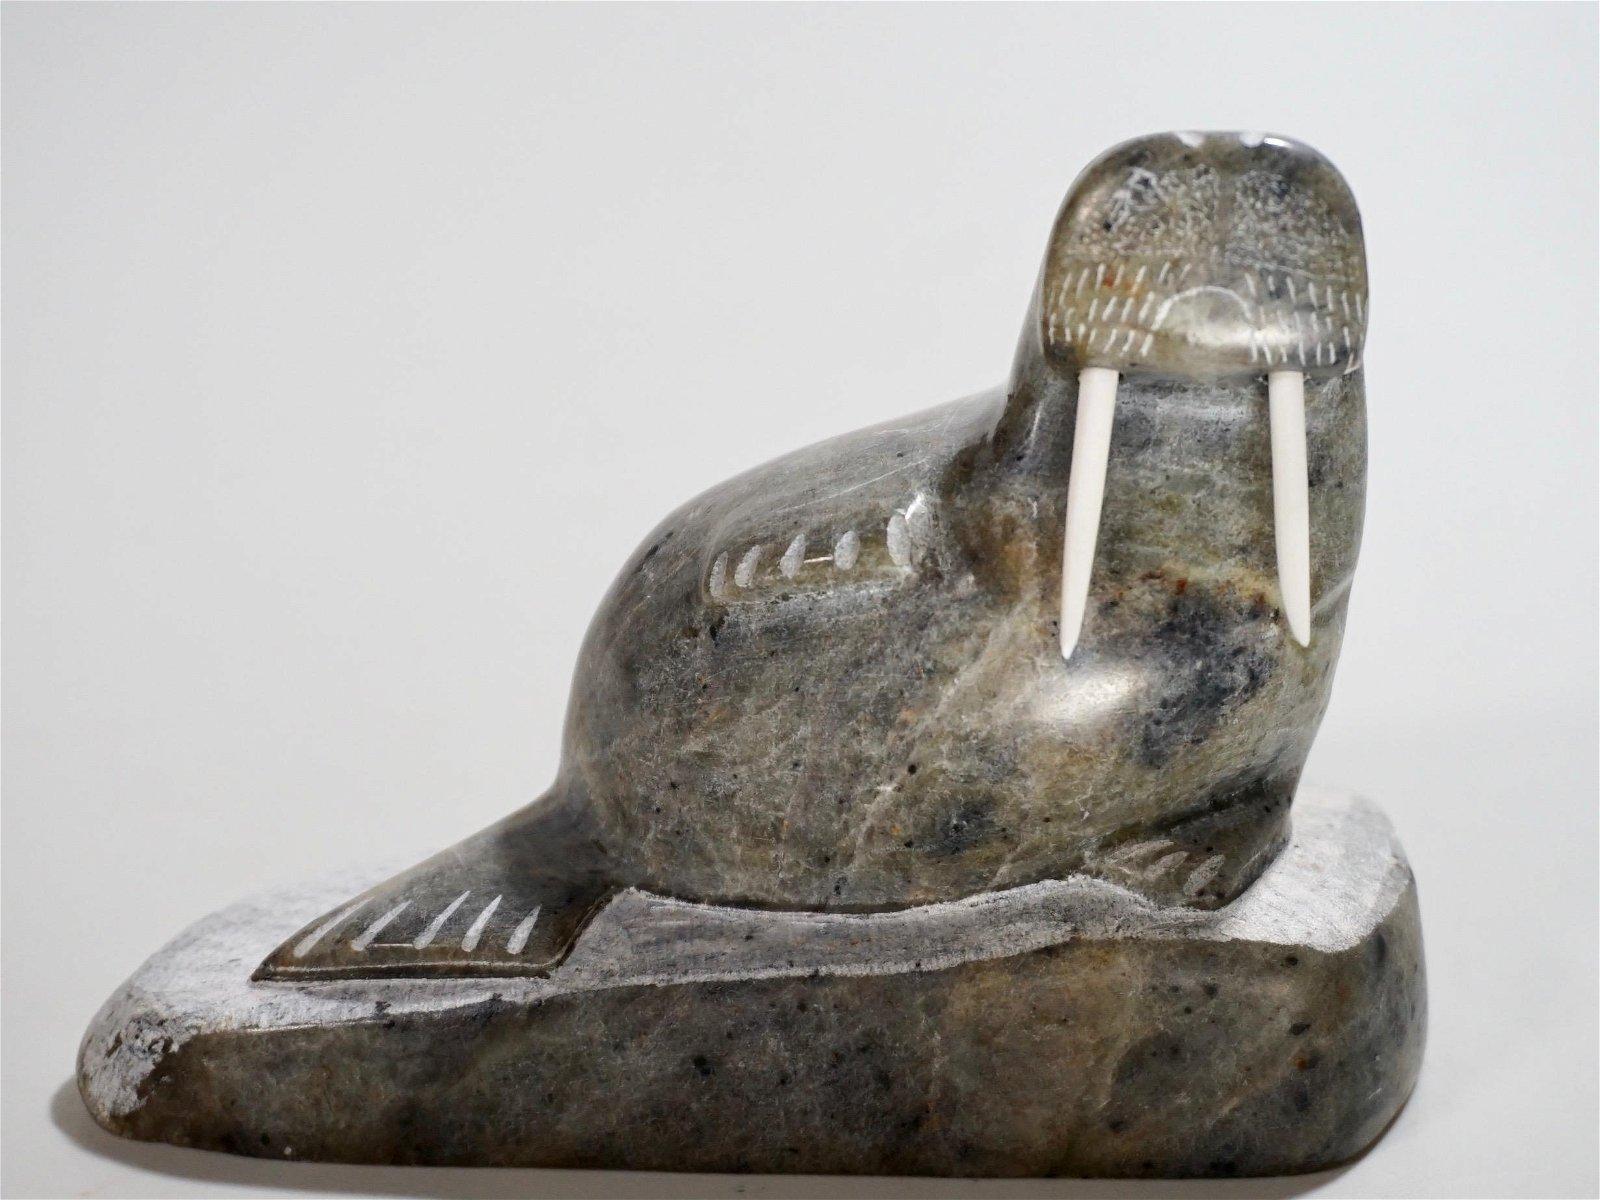 Inuit Eskimo Carved Stone Walrus Figurine